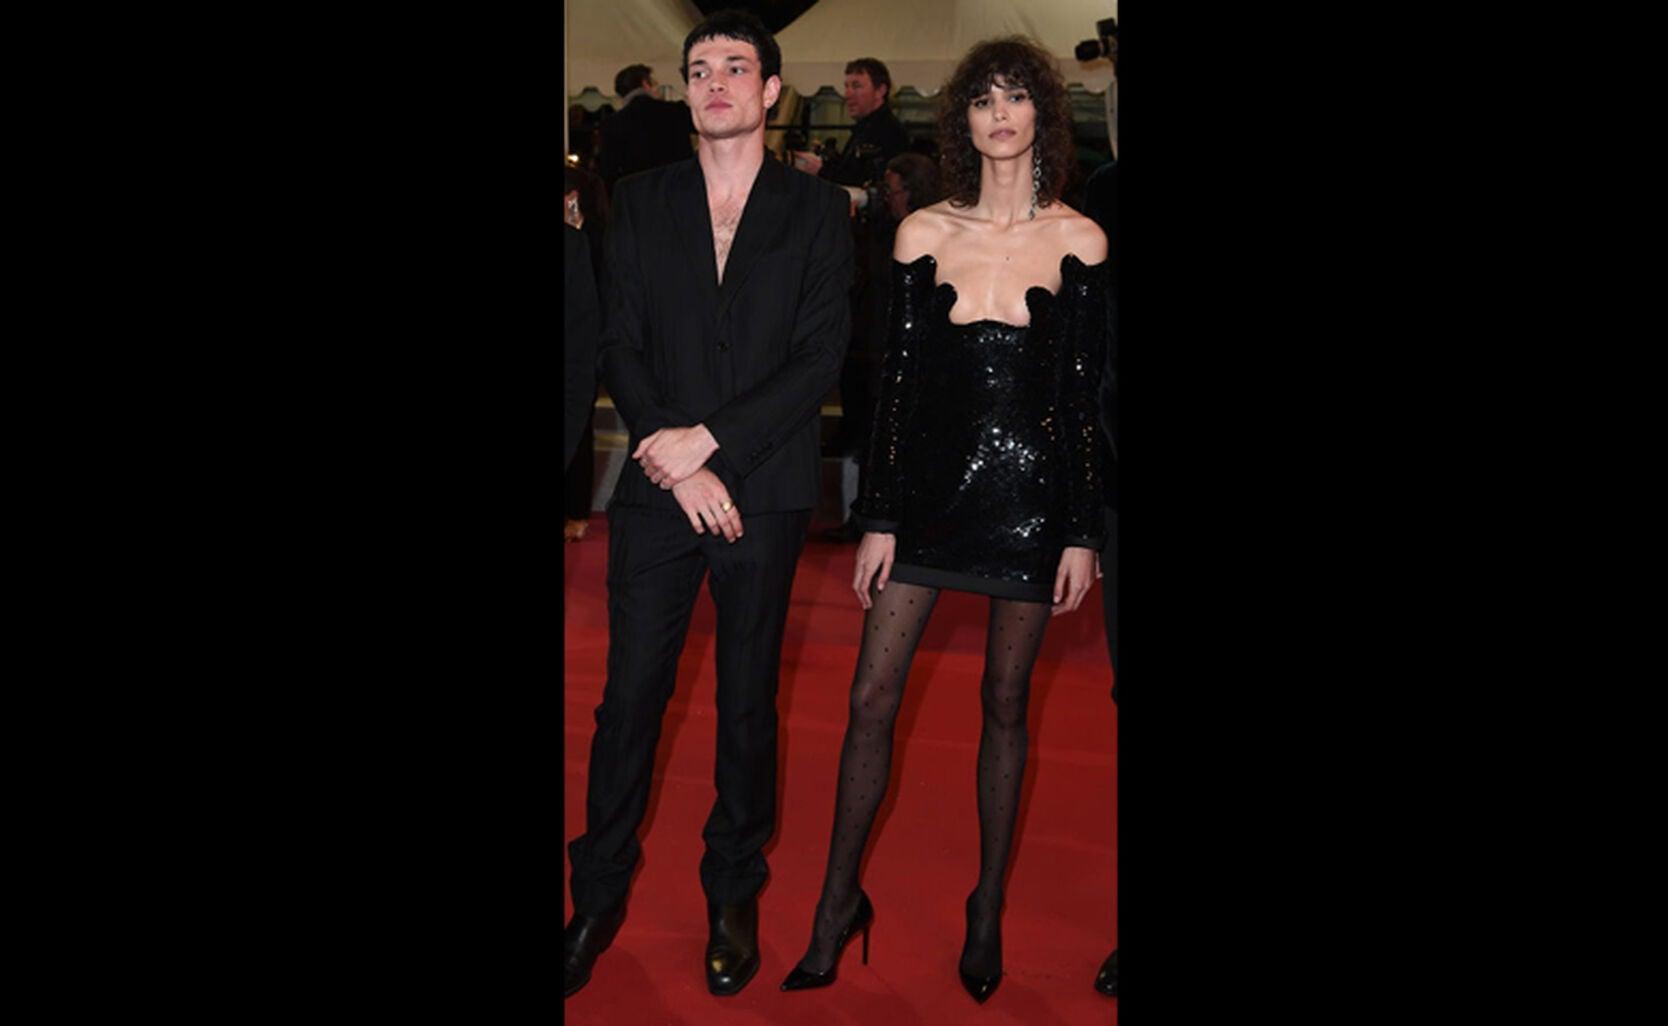 Luke Isaac and Stefania Cristian